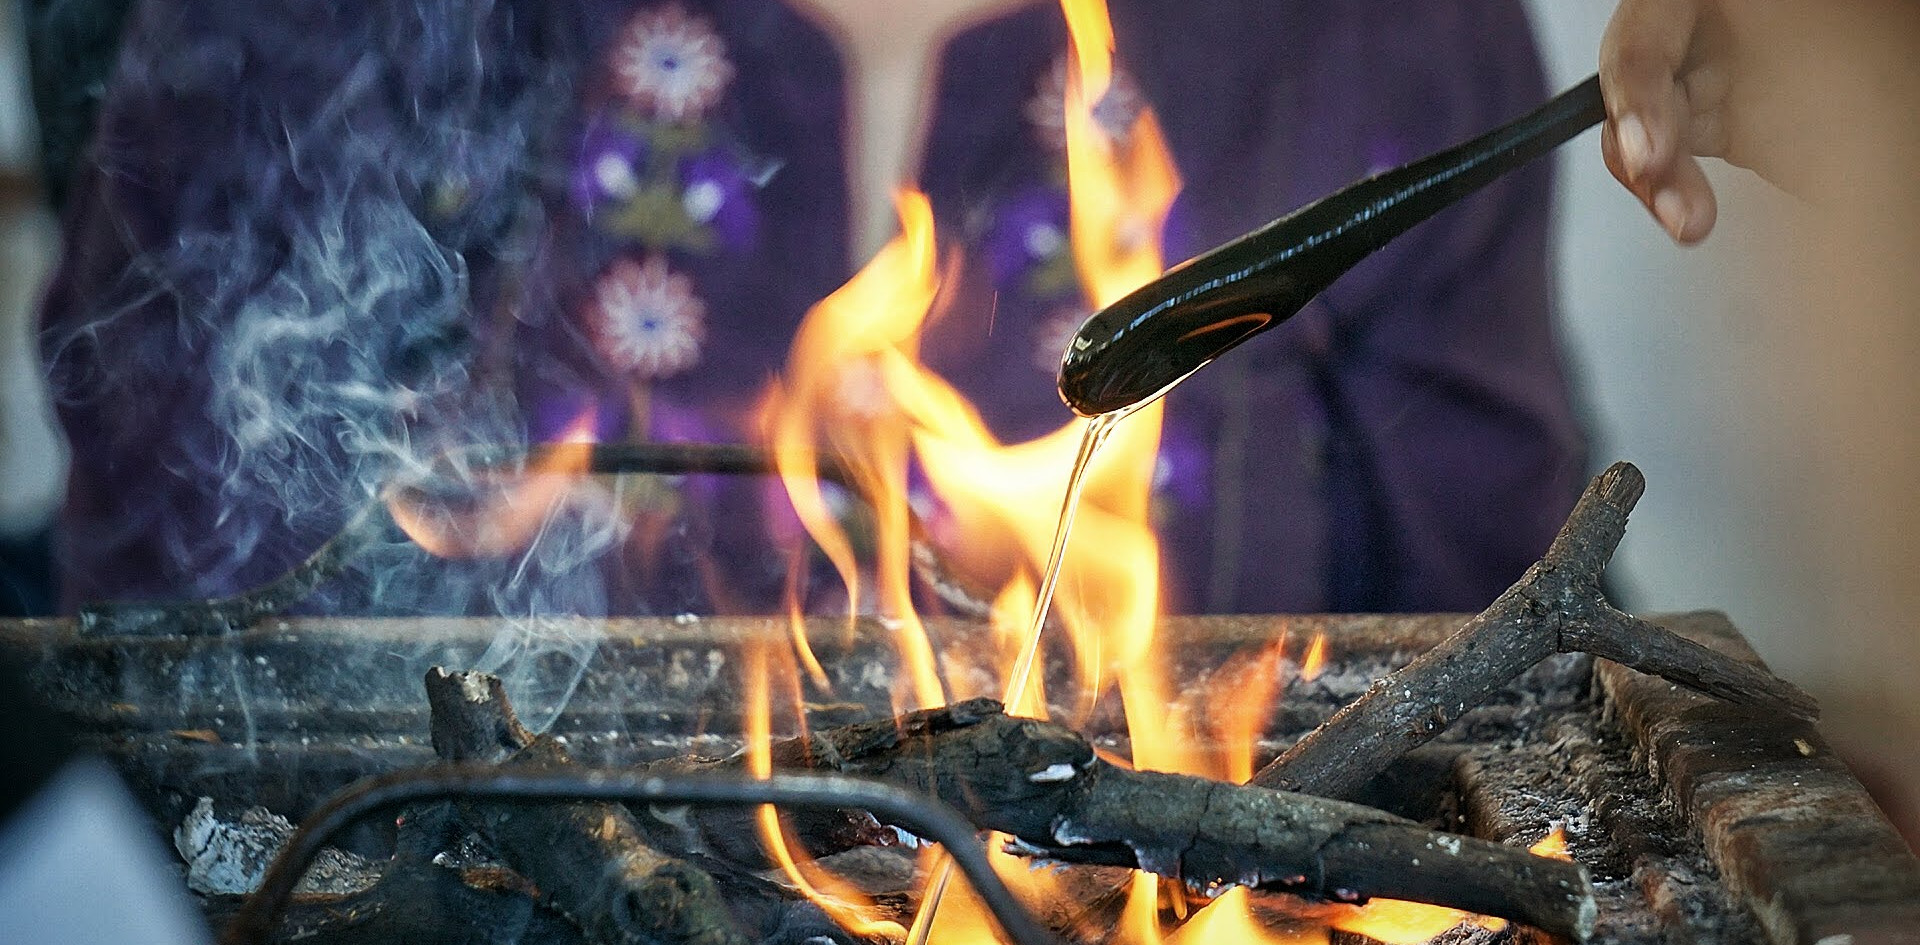 Fire Ritual at Phool Chatti Ashram, Rishikesh